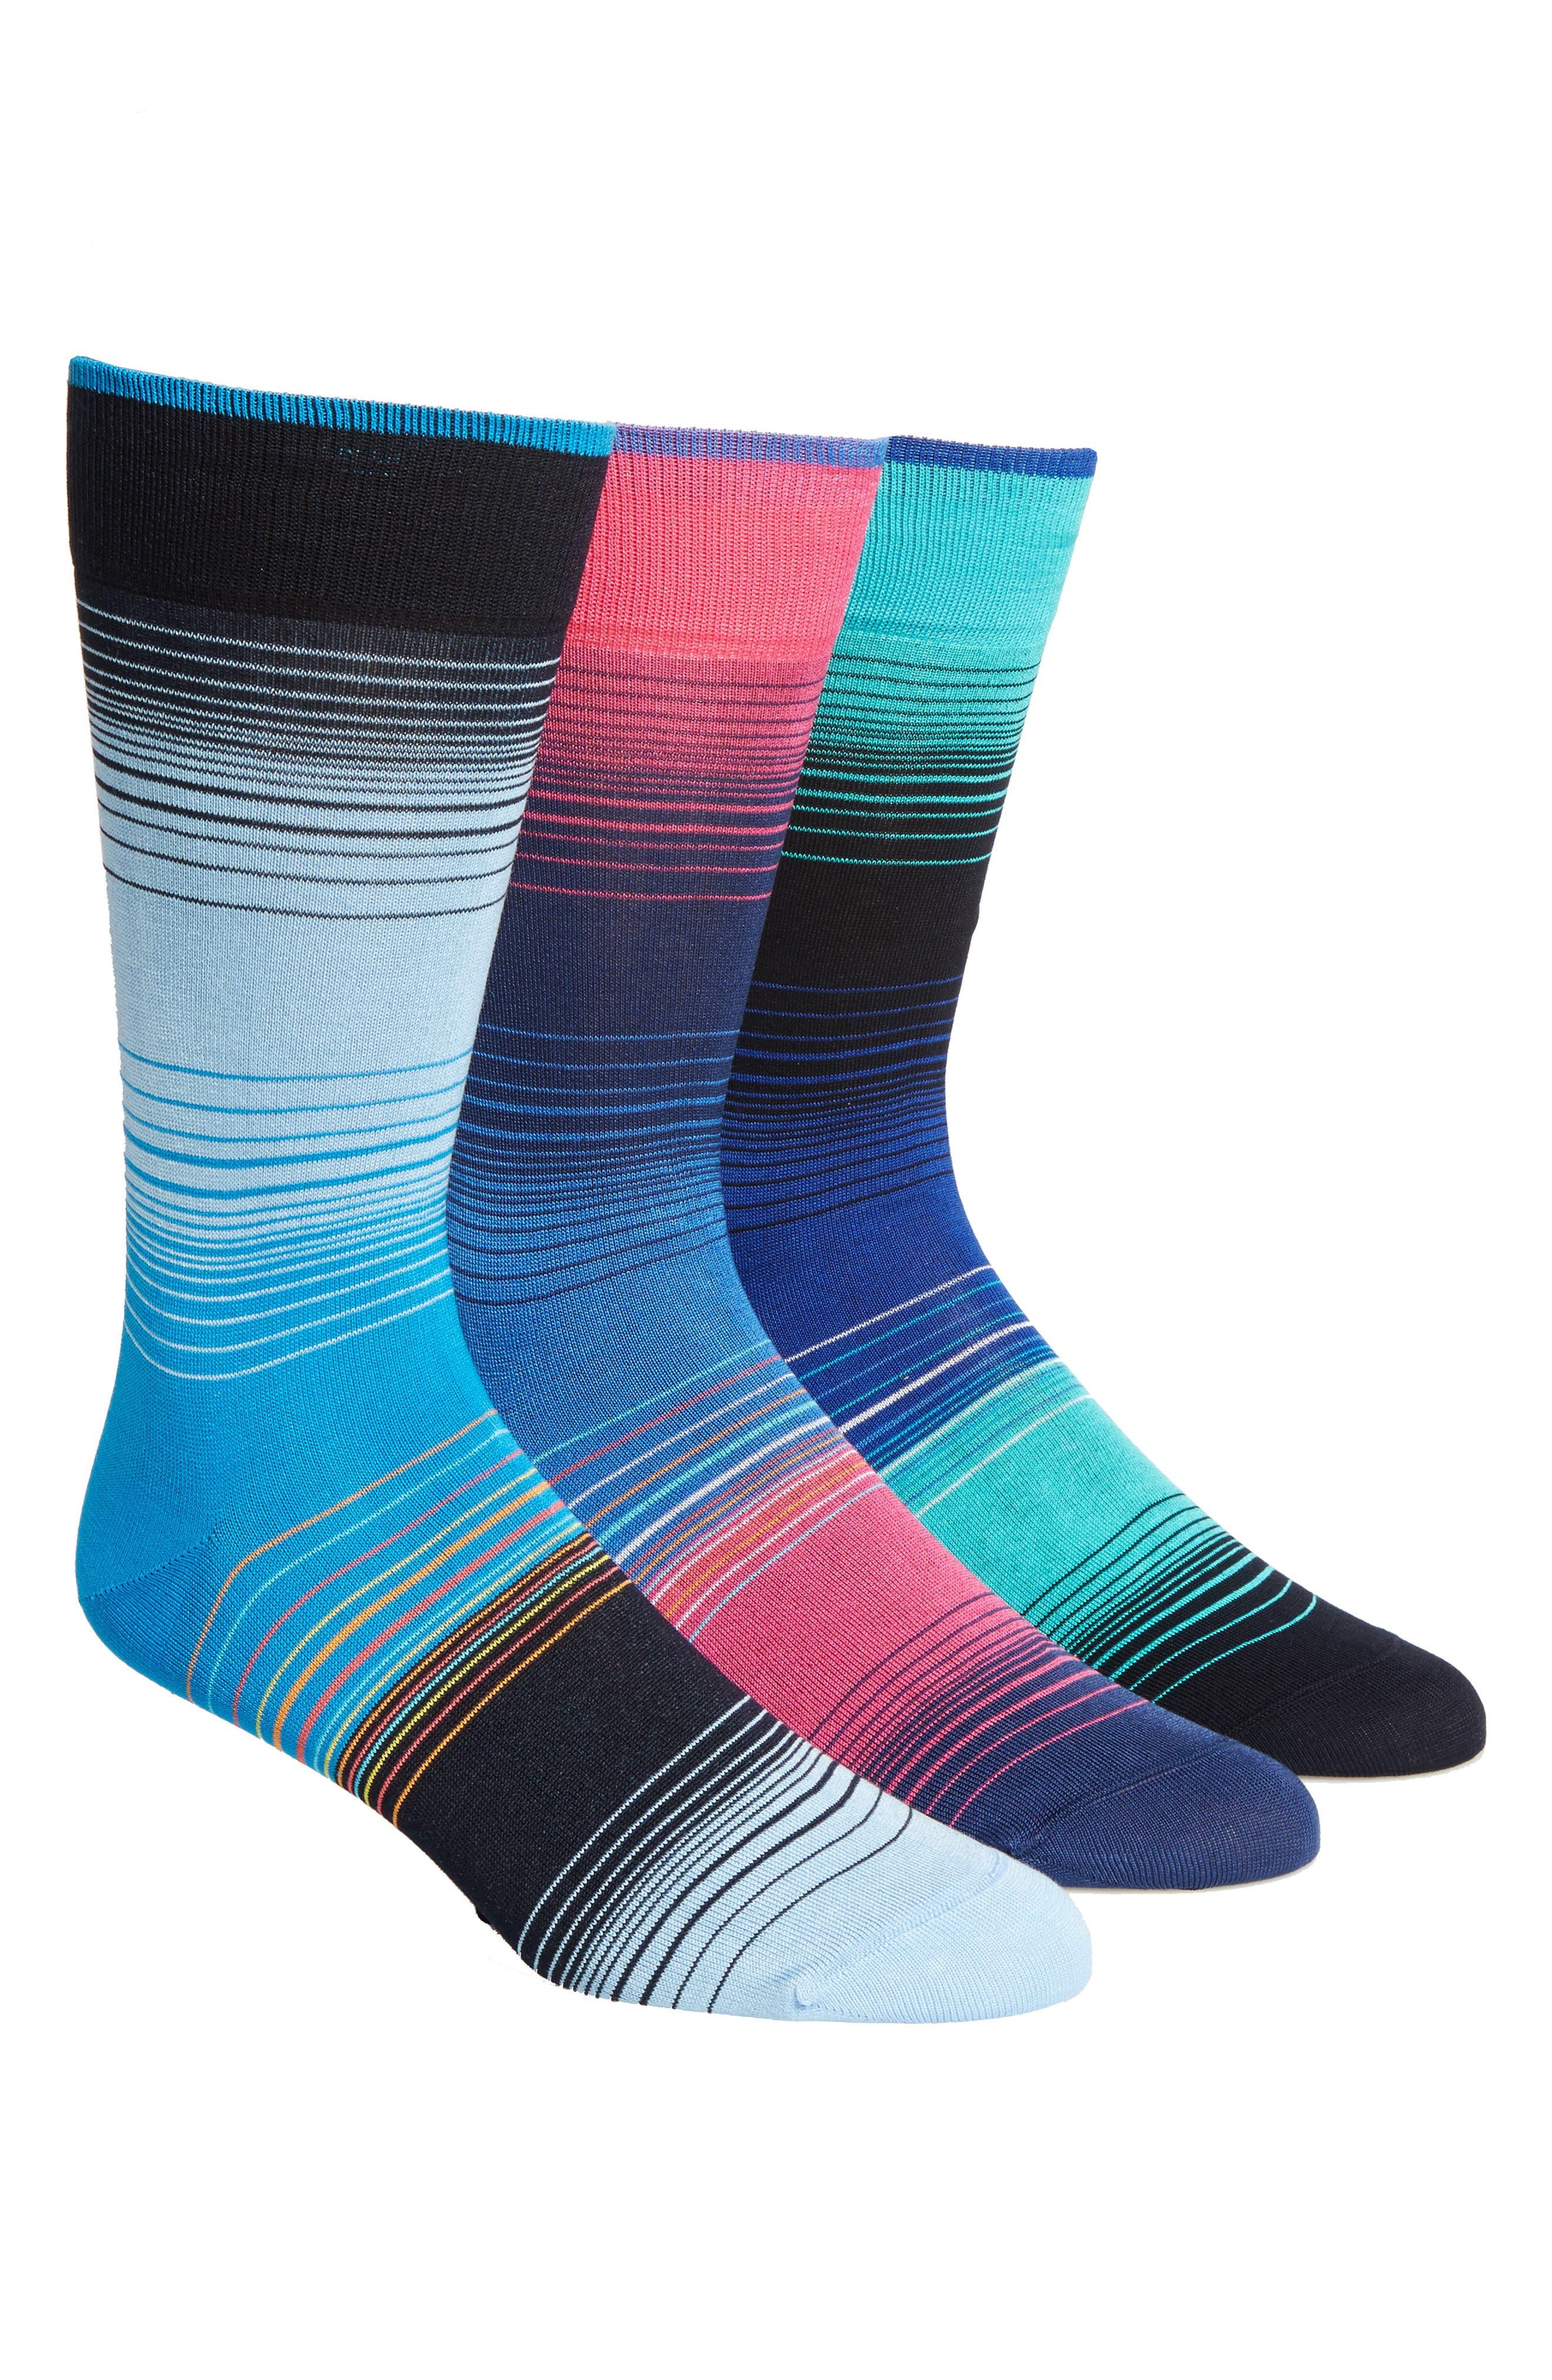 3-Pack Cotton Blend Socks,                         Main,                         color, Blue/ Navy/ Light Blue Stripe